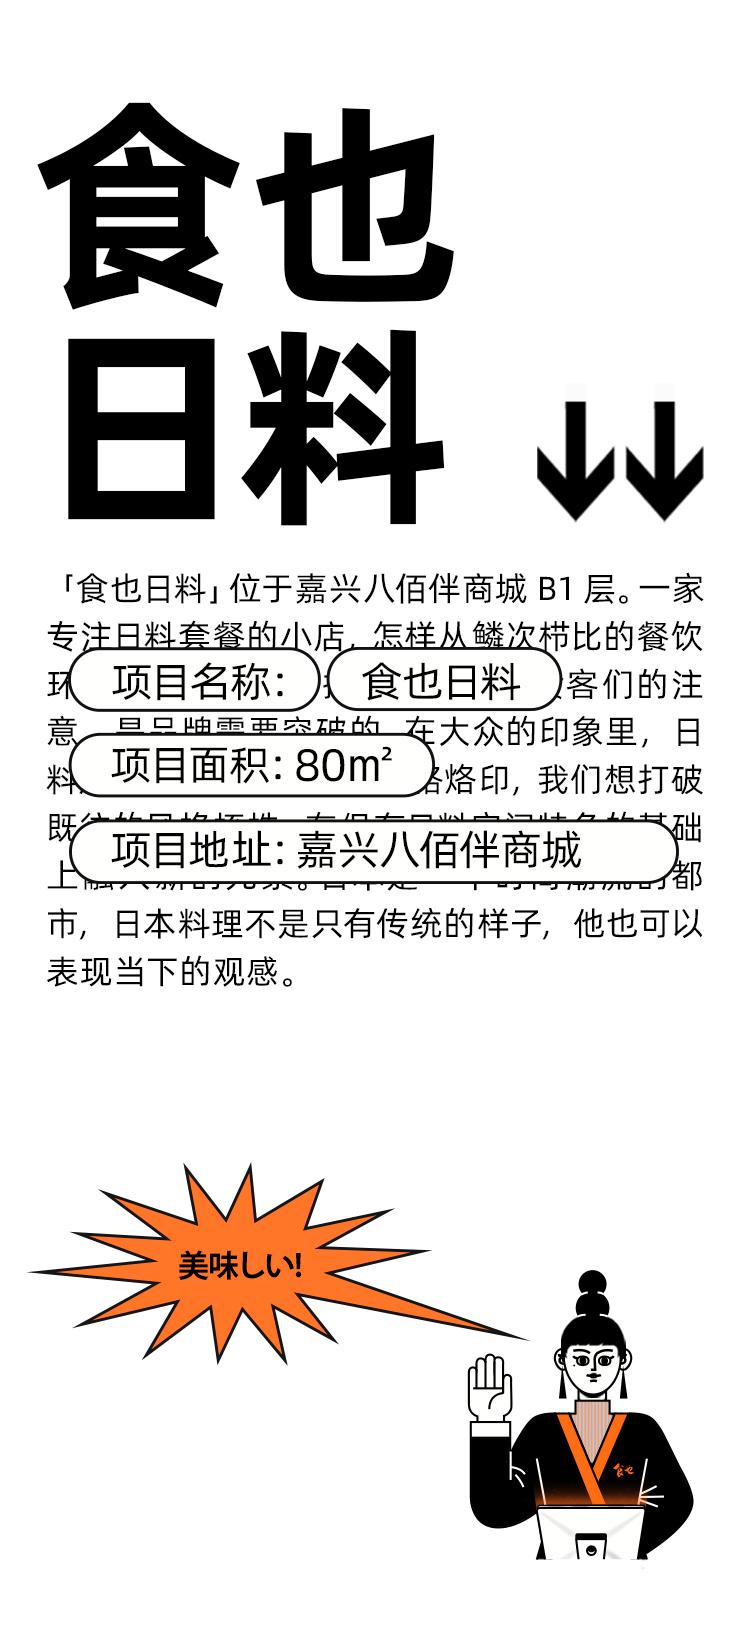 images-食也日料公众号推文_01